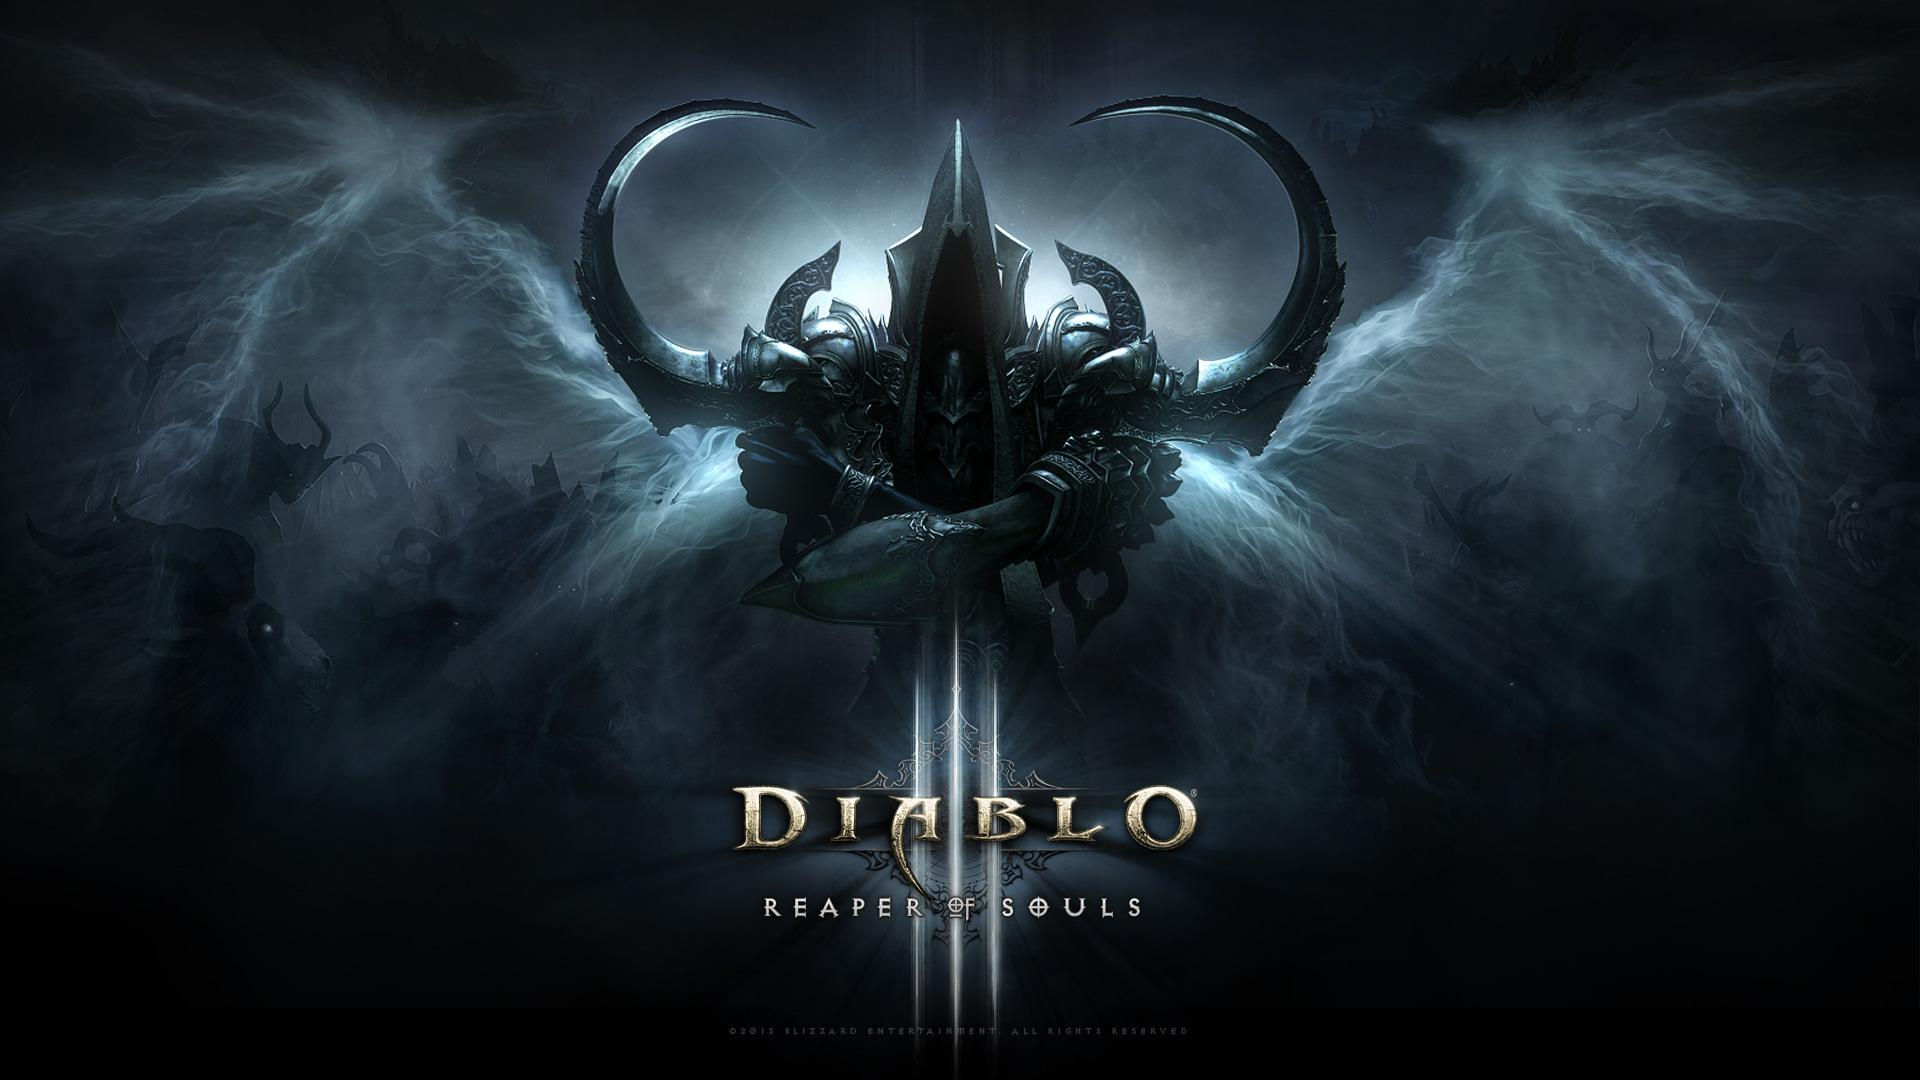 Diablo III reaper of souls header